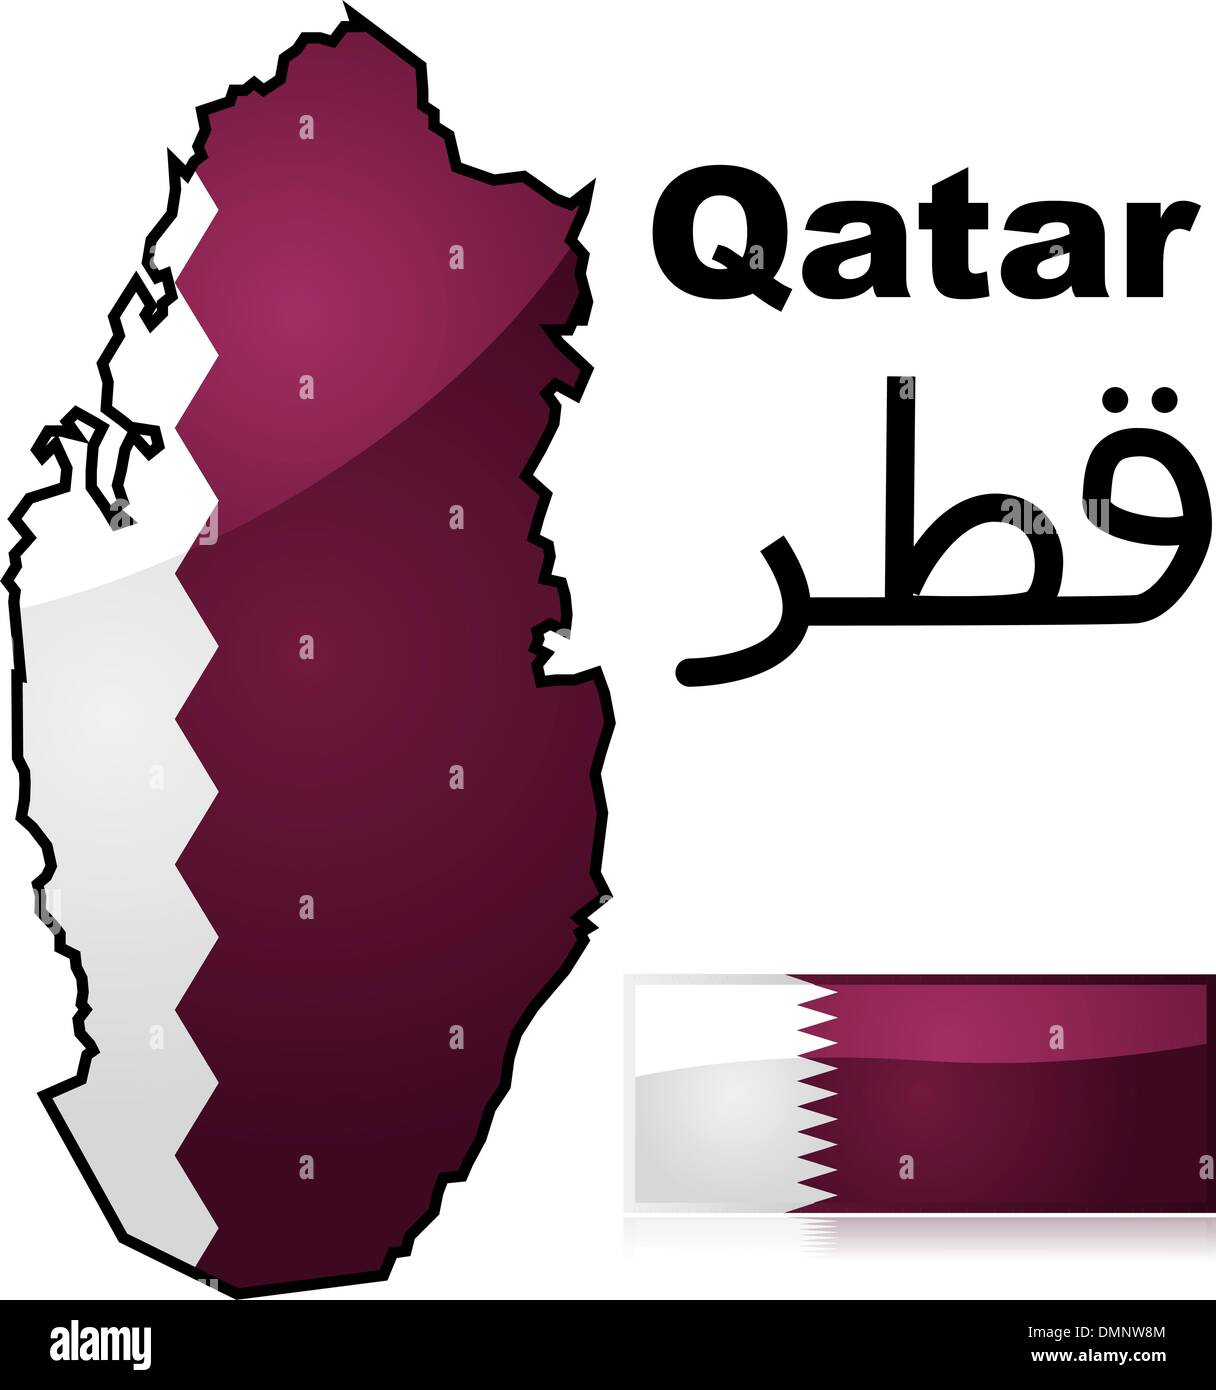 Qatar map and flag Stock Vector Art & Illustration, Vector Image ...